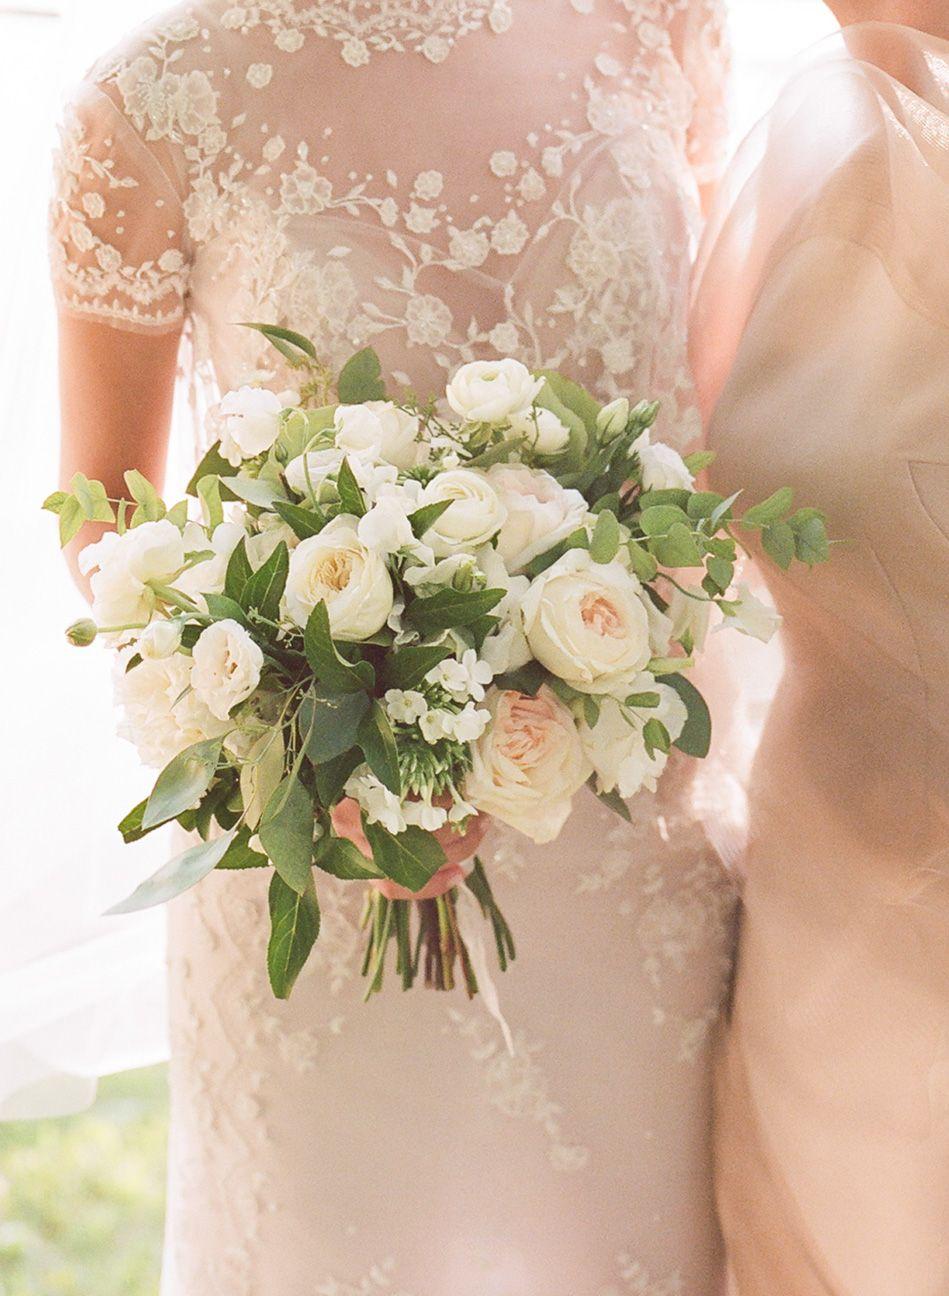 KarenHillPhotography-Parizat-Wedding-0346.jpg